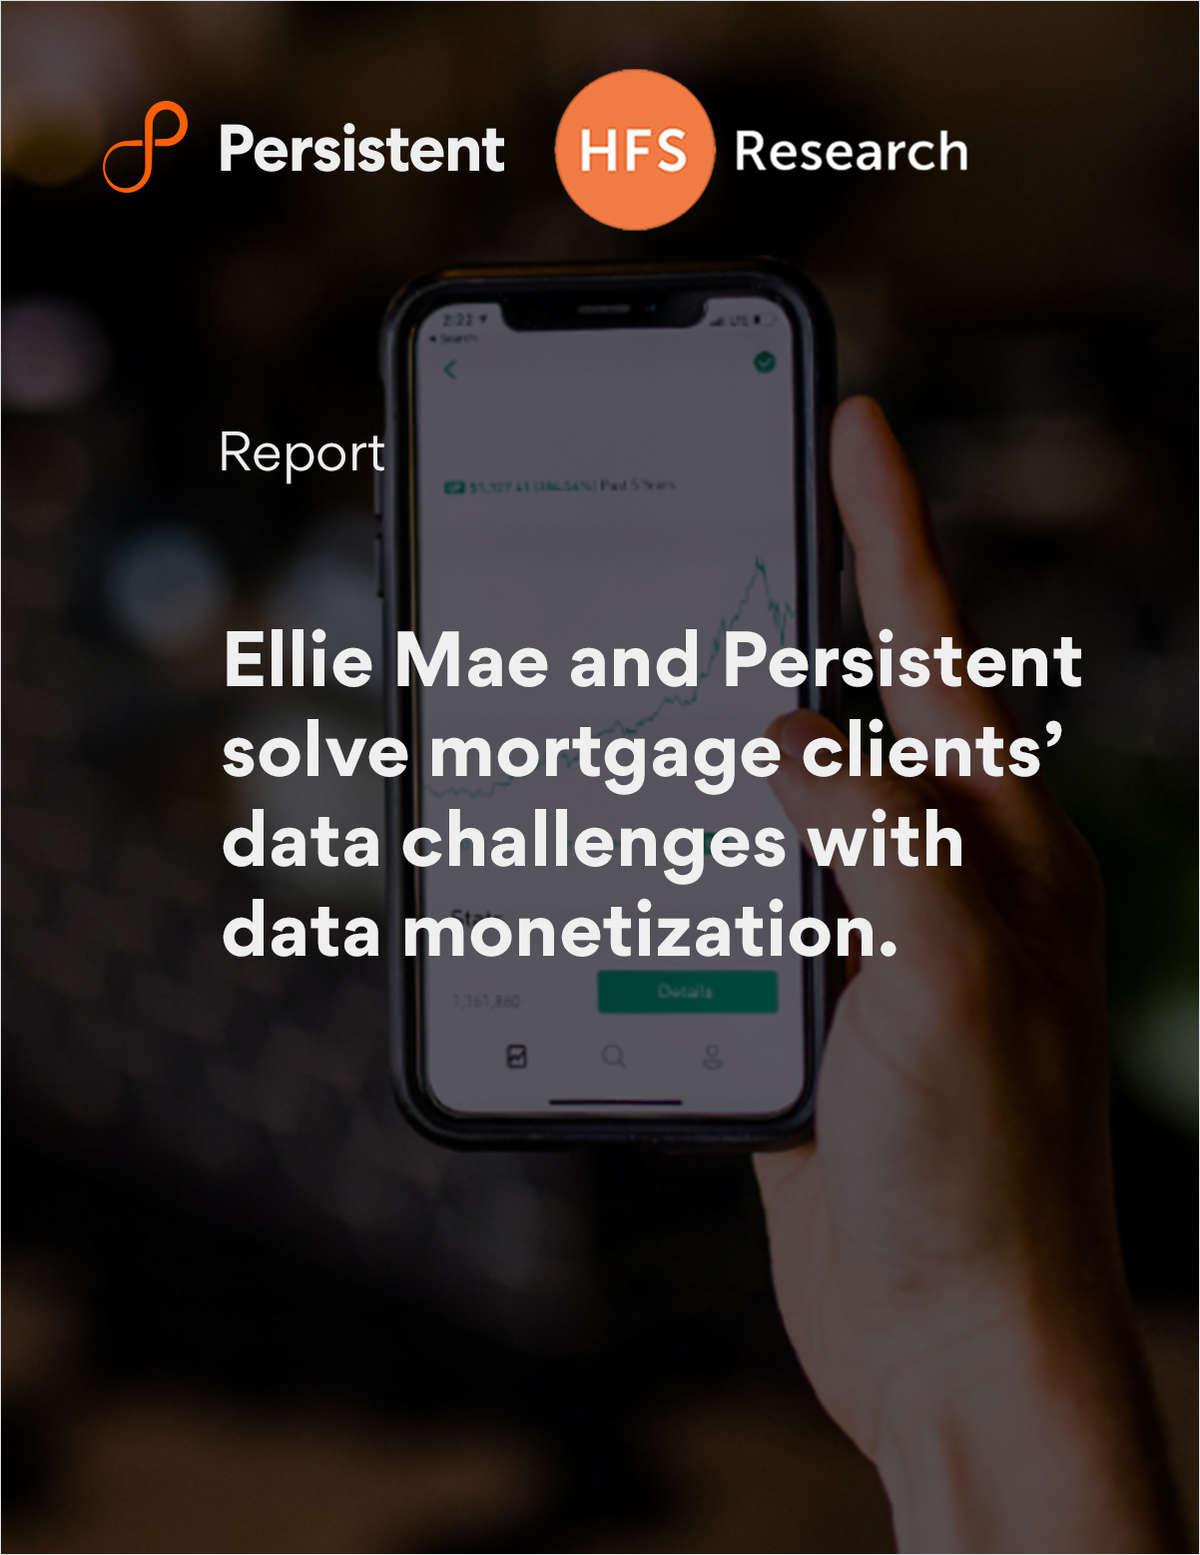 HFS Research Report: Data Monetization